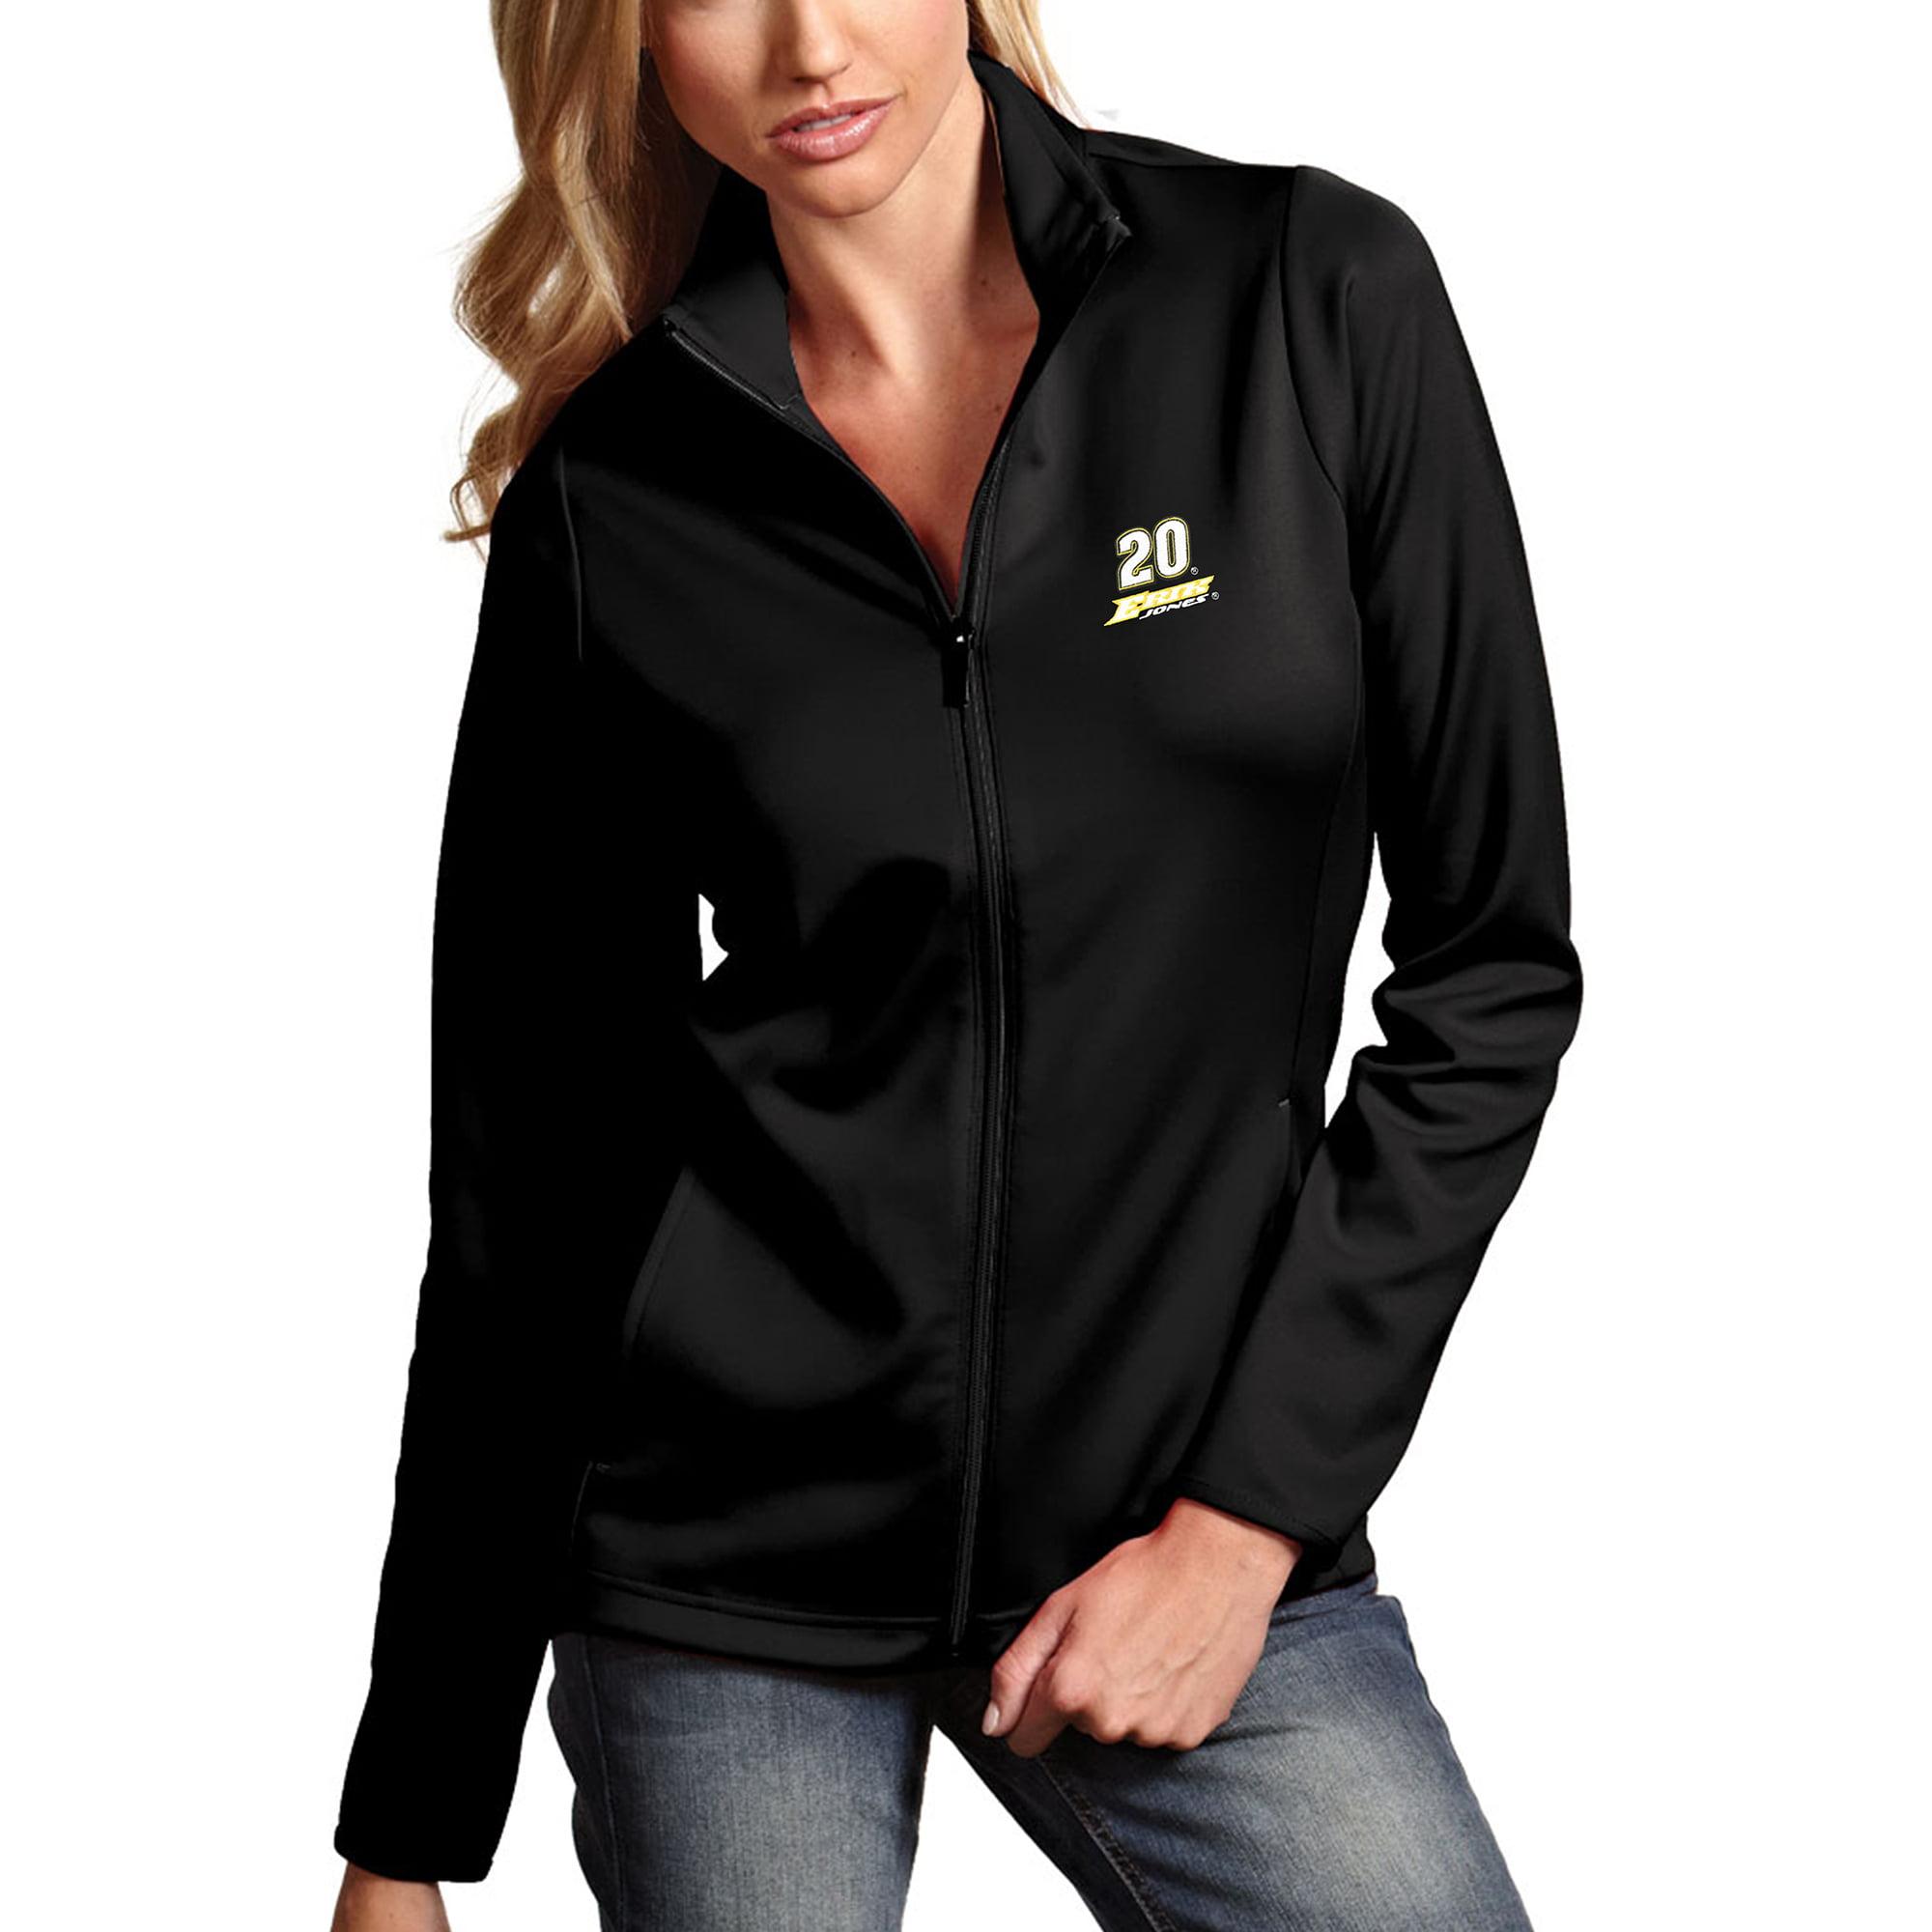 Erik Jones Antigua Women's Leader Full-Zip Jacket - Black